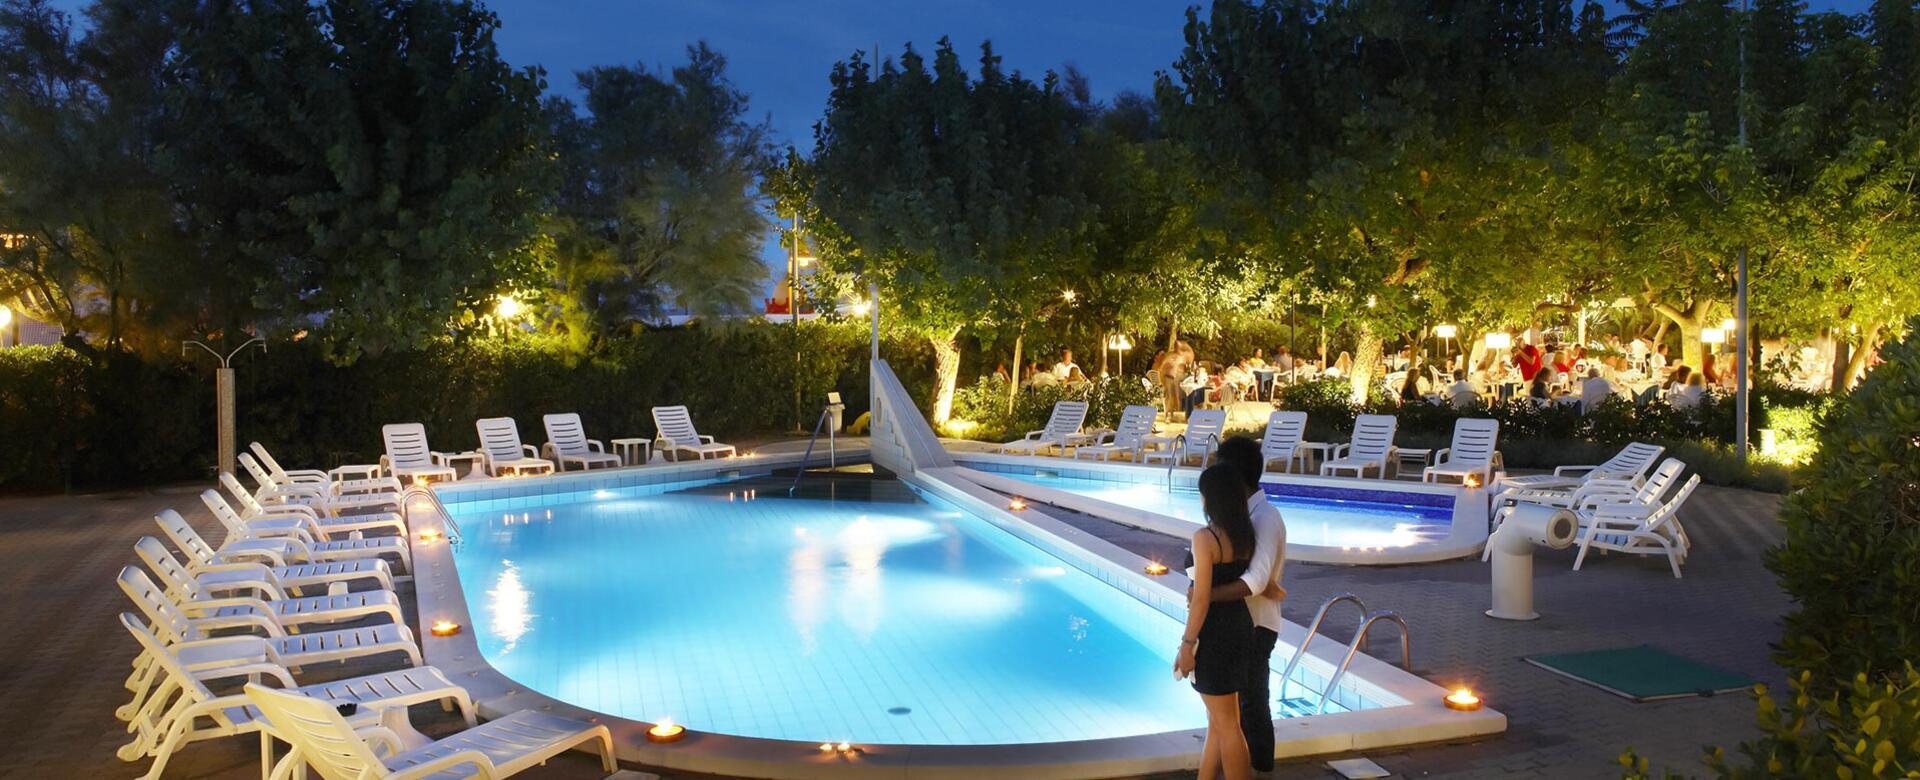 alexandraplaza en offers-hotel-riccione 003